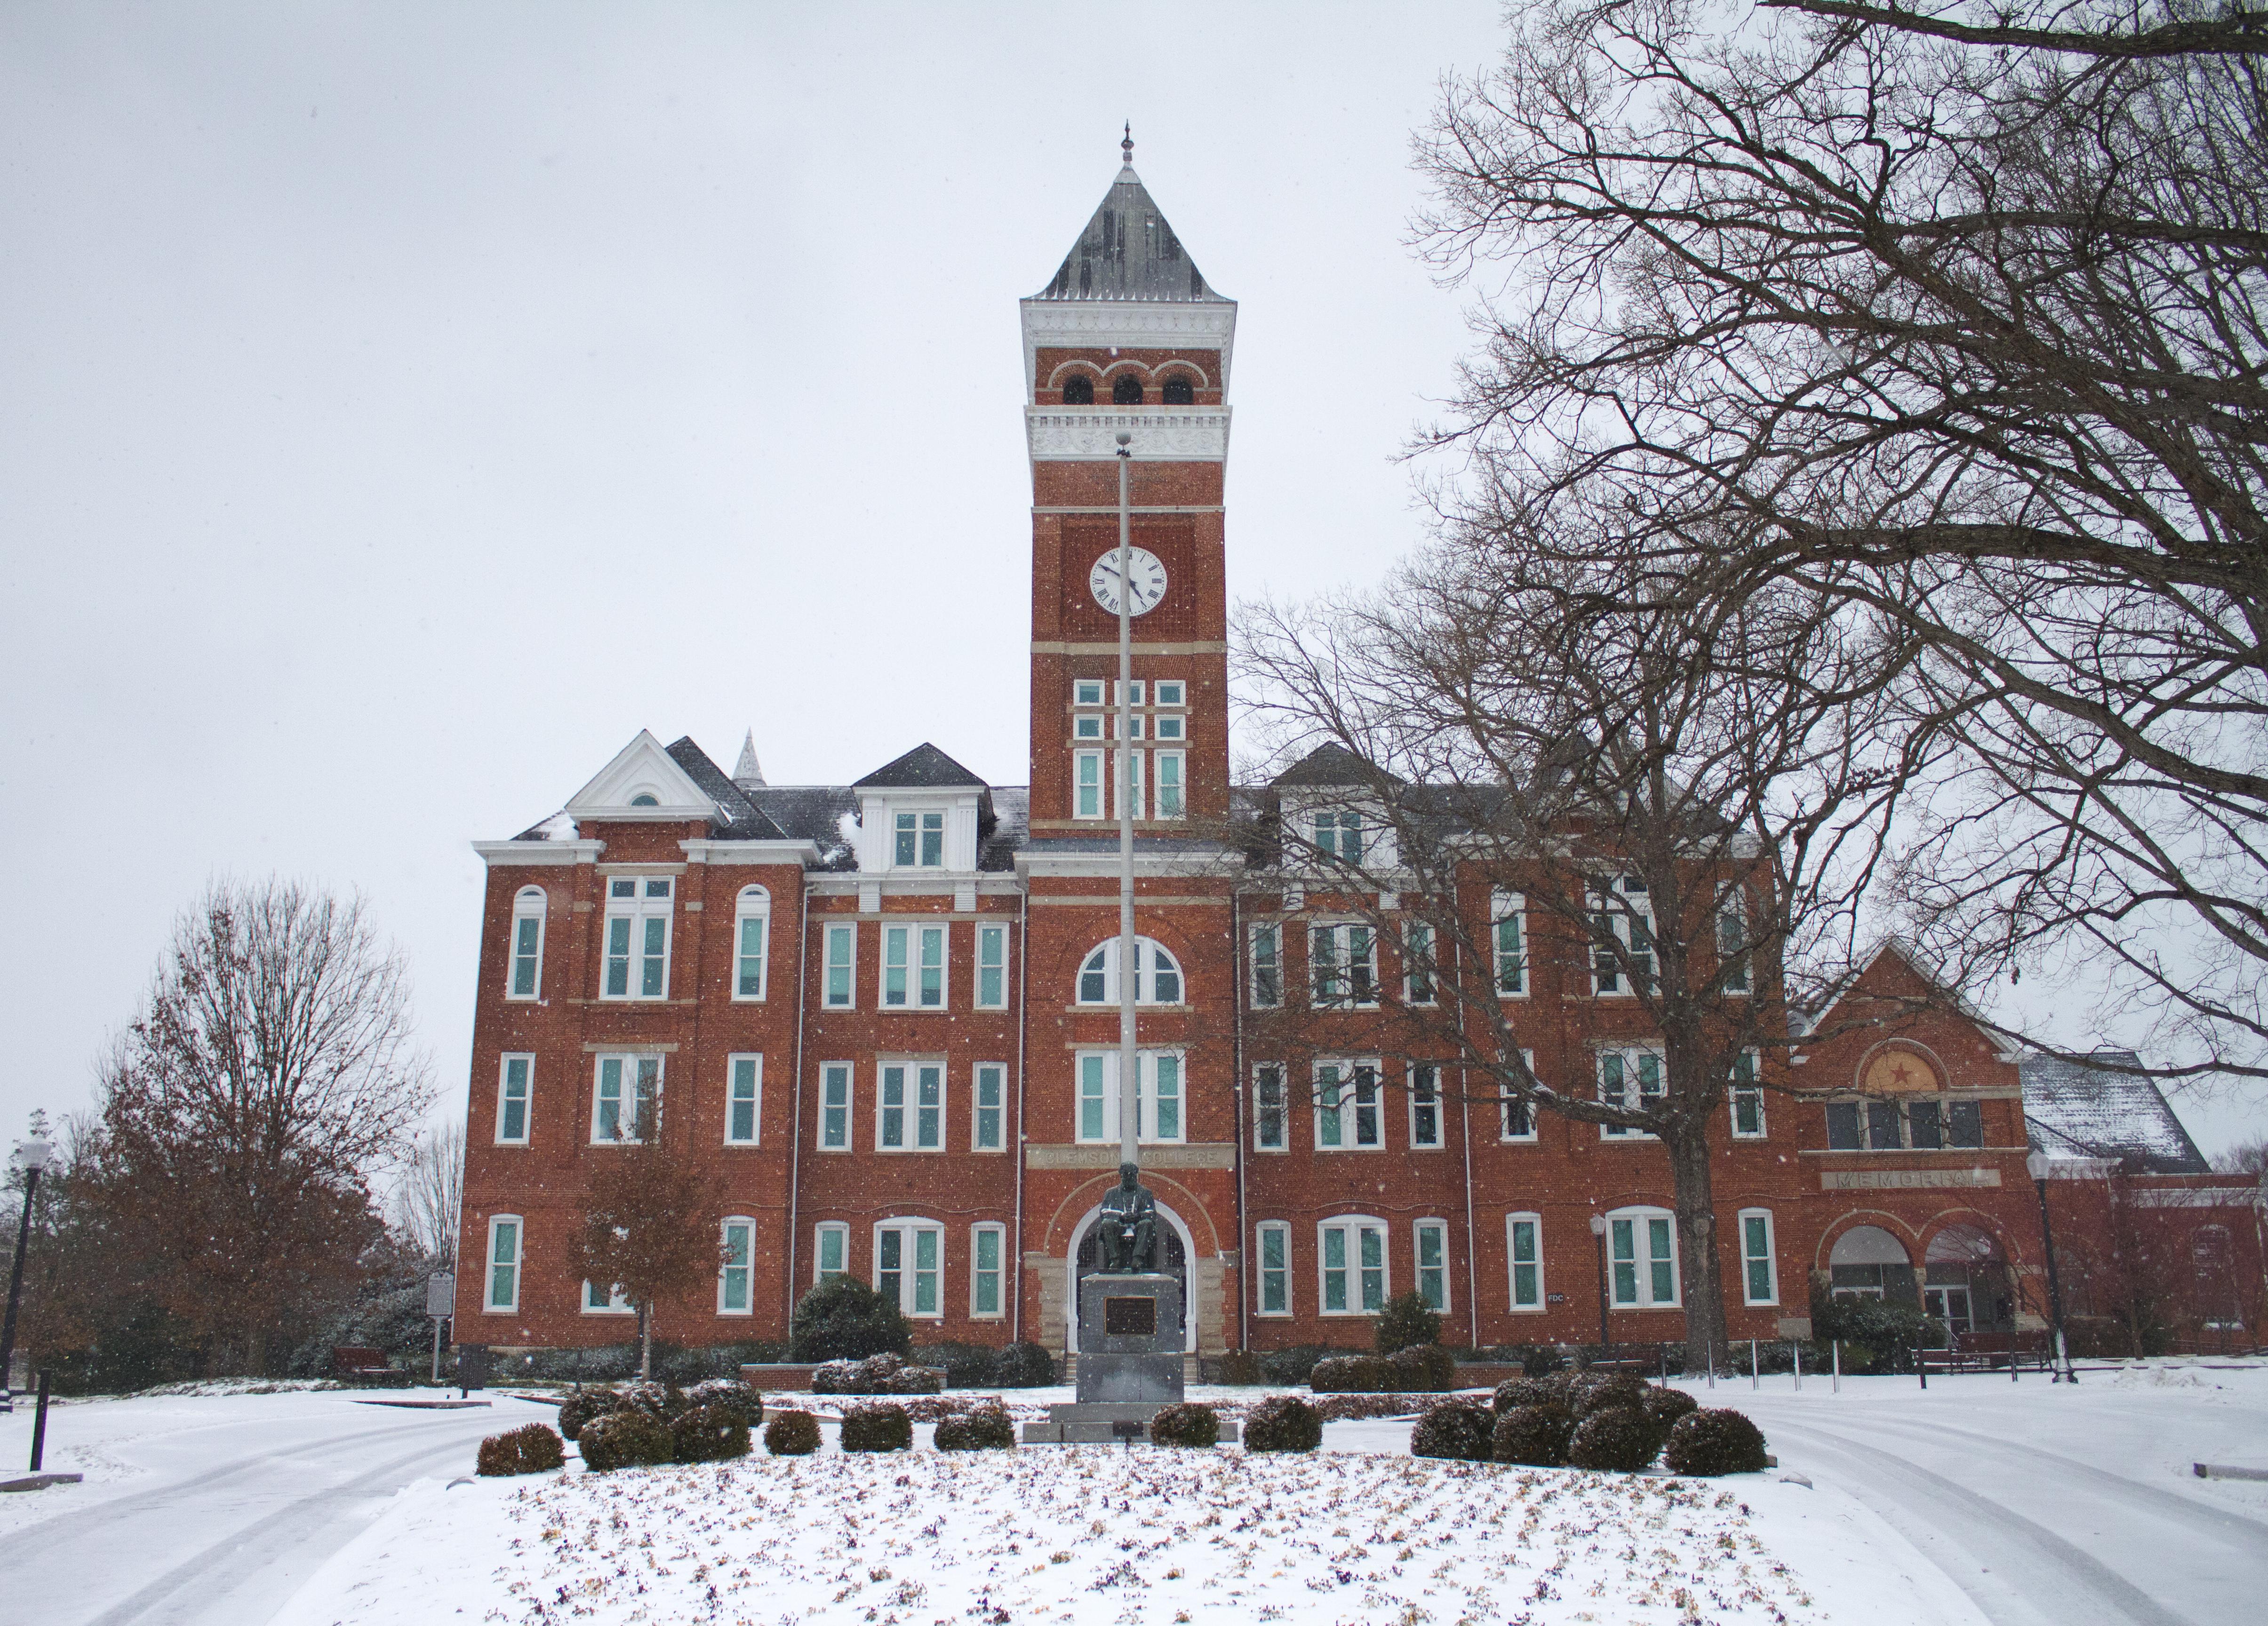 Clemson University Tillman Hall in winter during a rare snowfall February, 2014, Clemson, South Carolina.